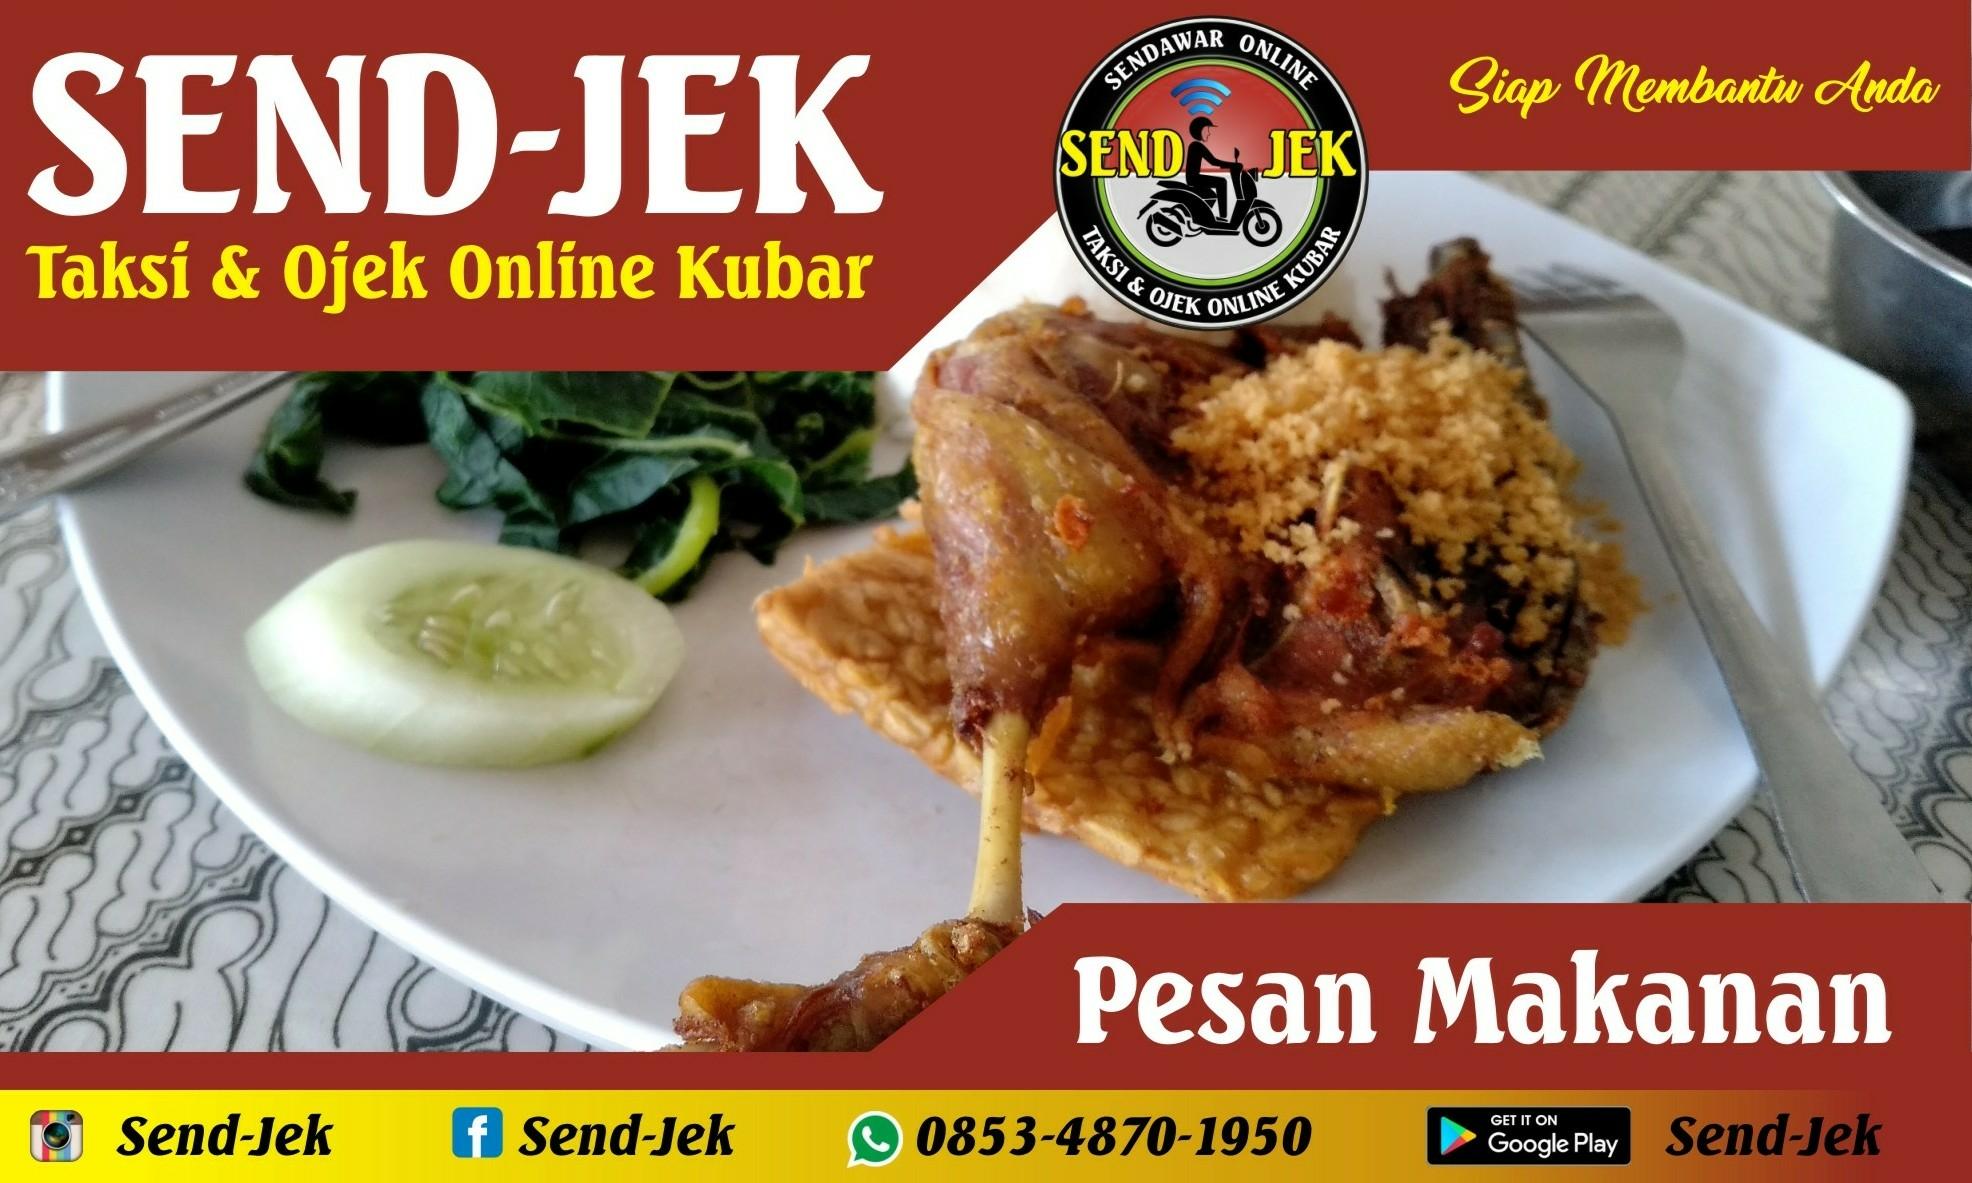 Send-Jek 6